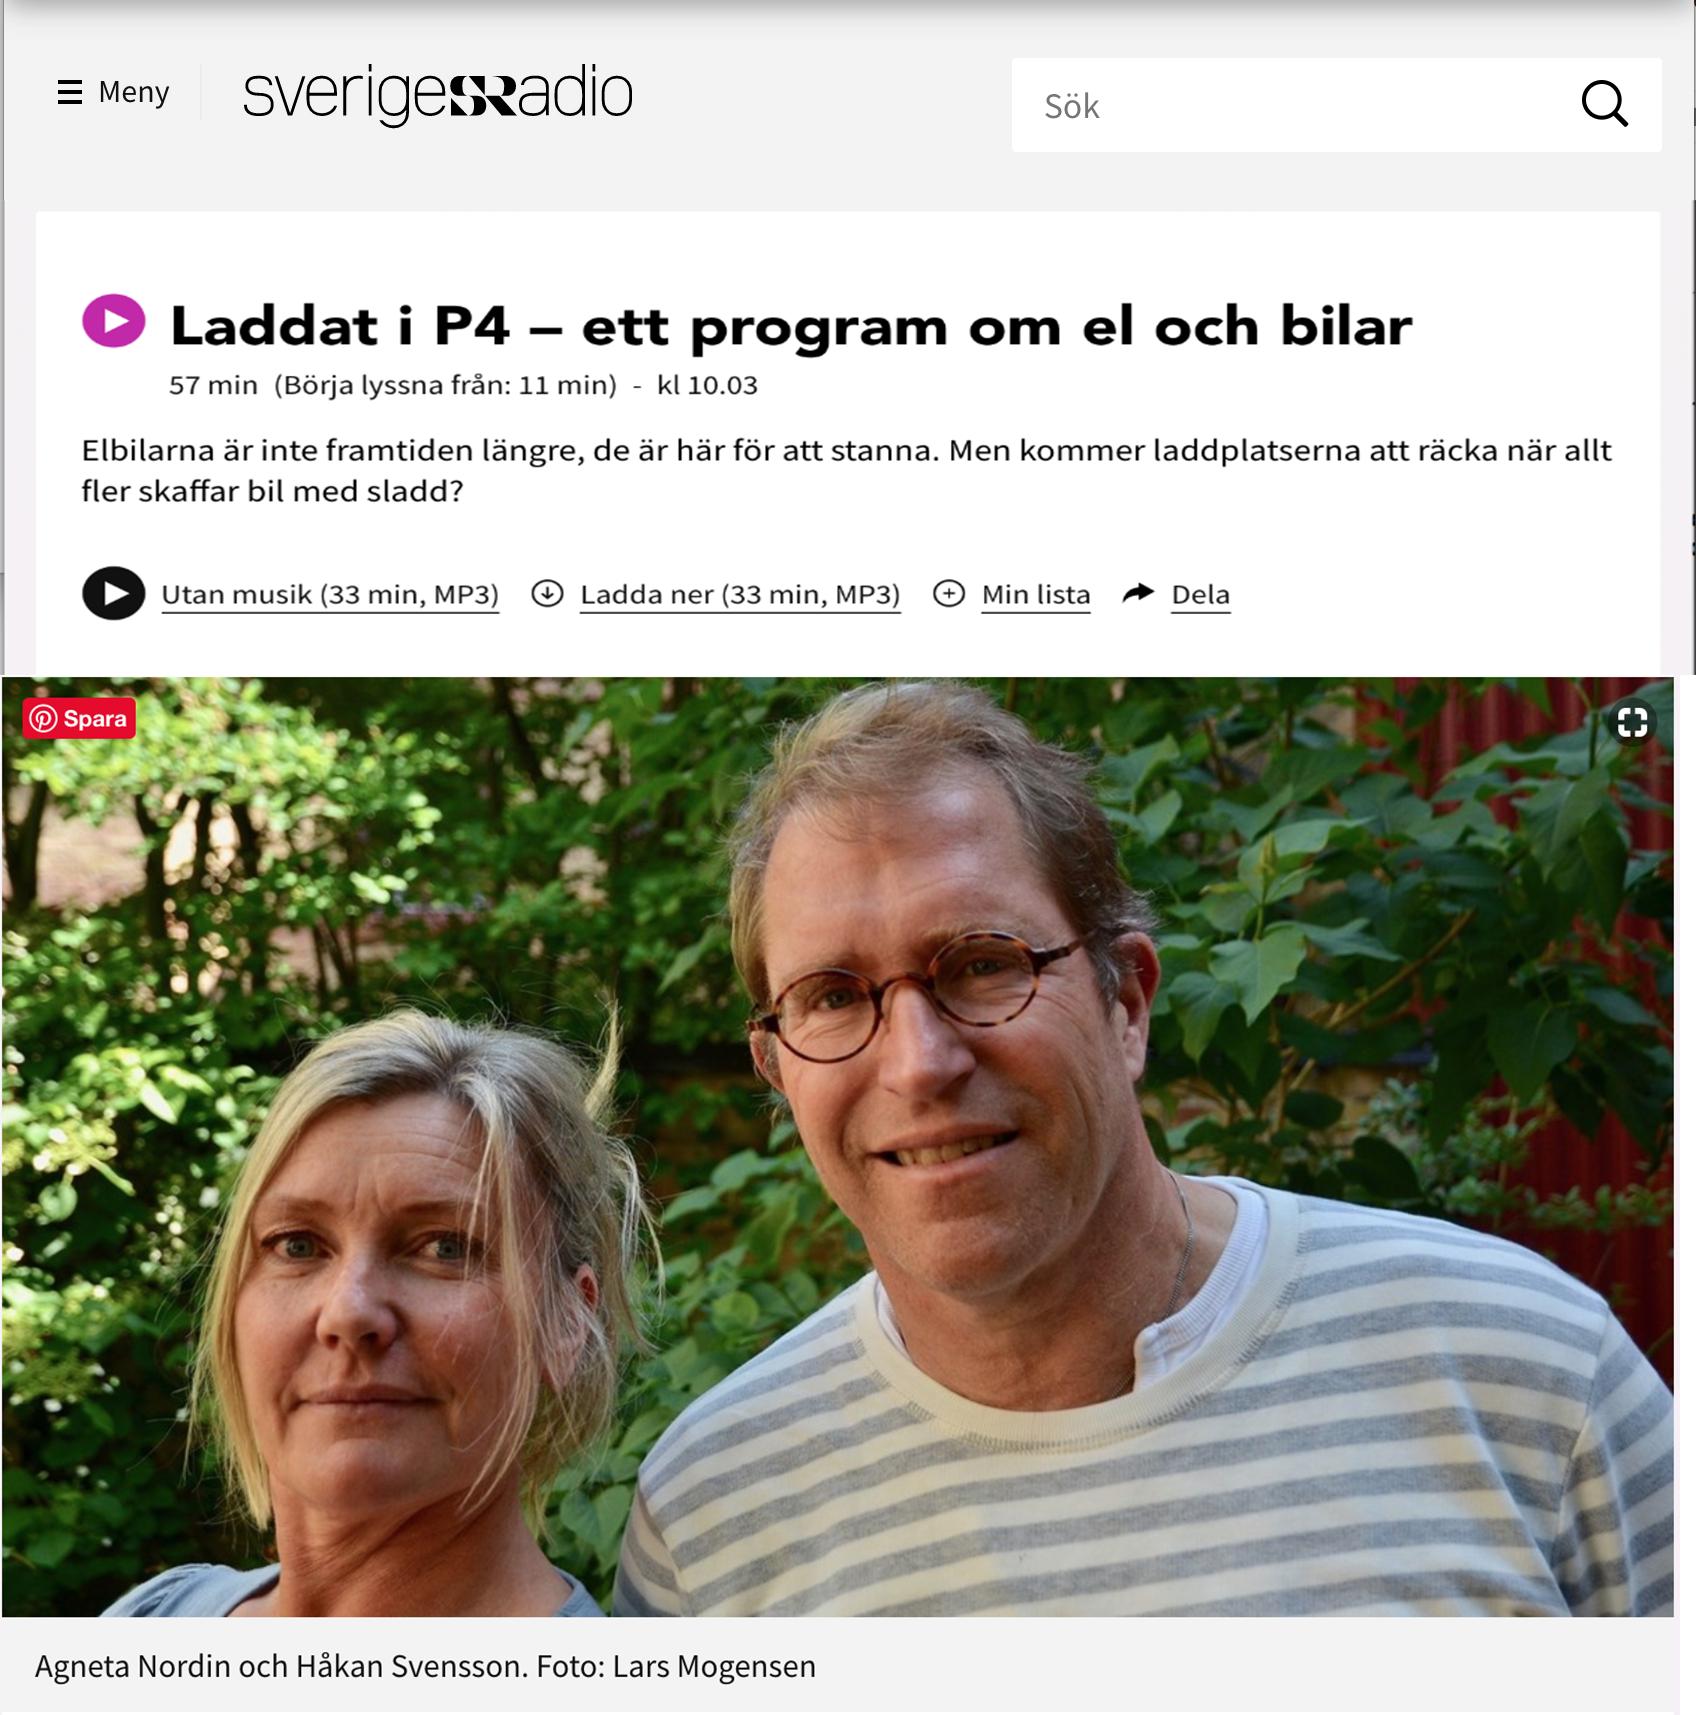 Sveriges Radio Laddat i P4